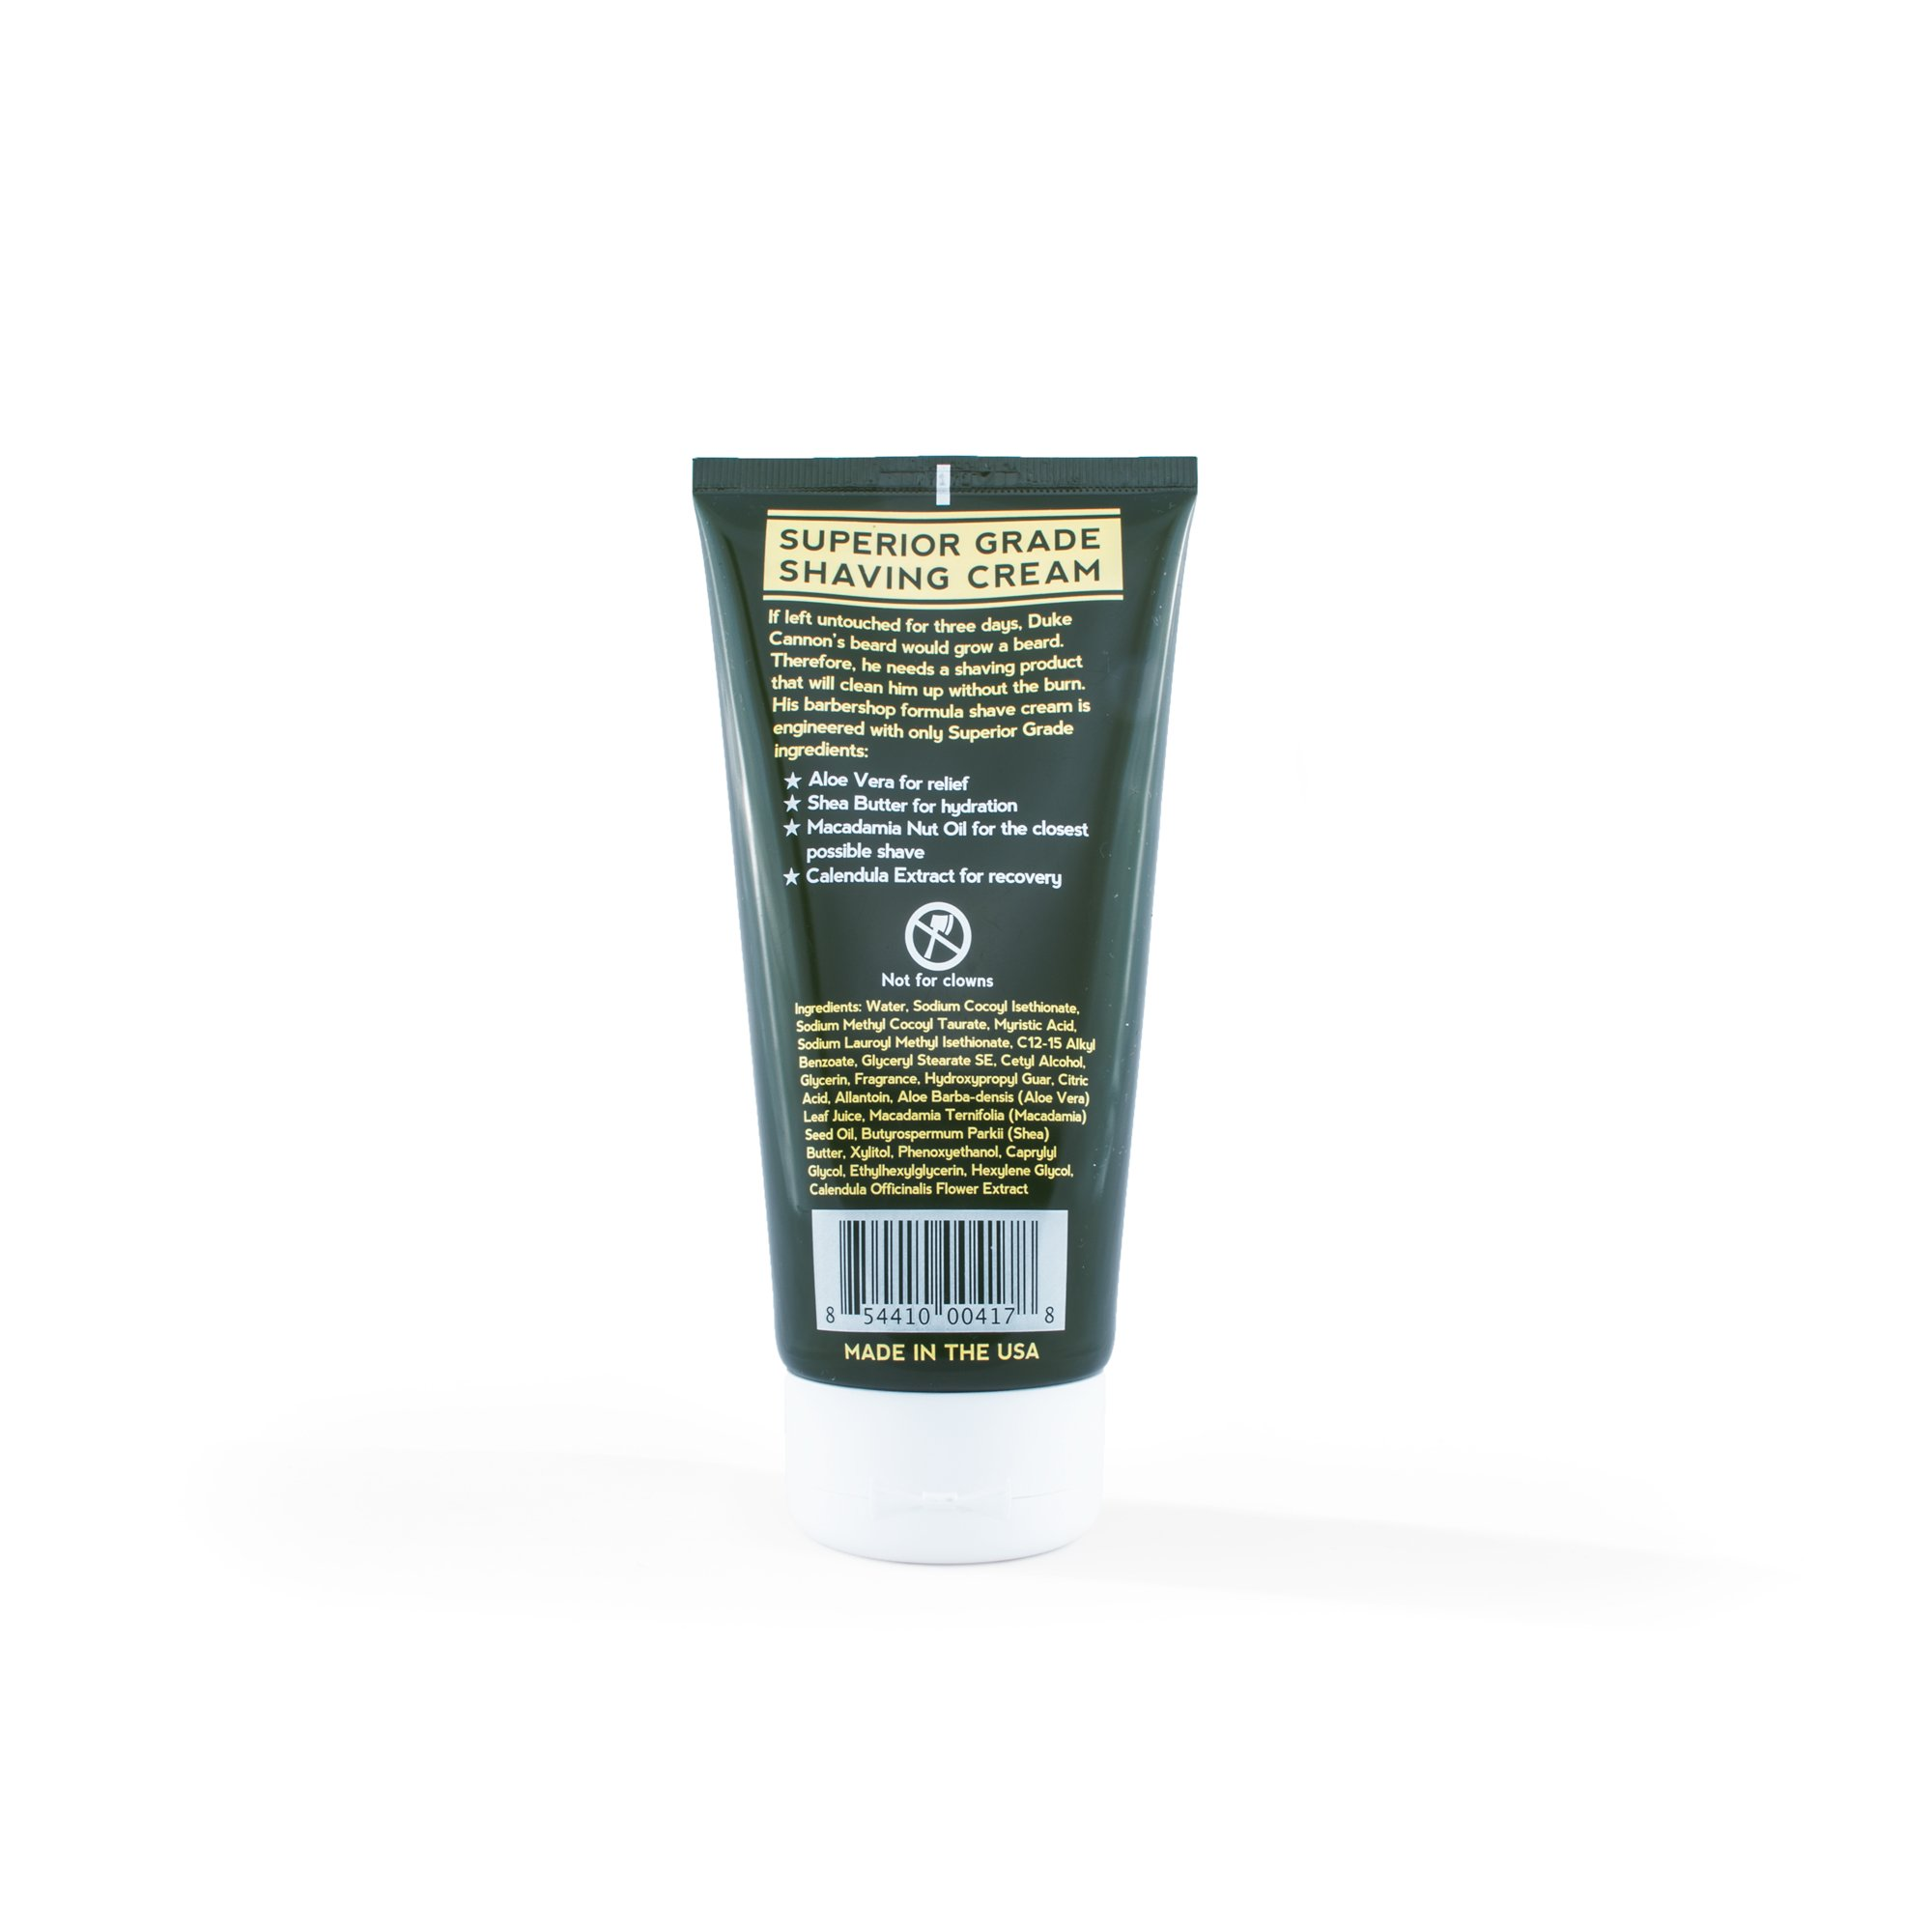 Superior Grade Shaving Cream